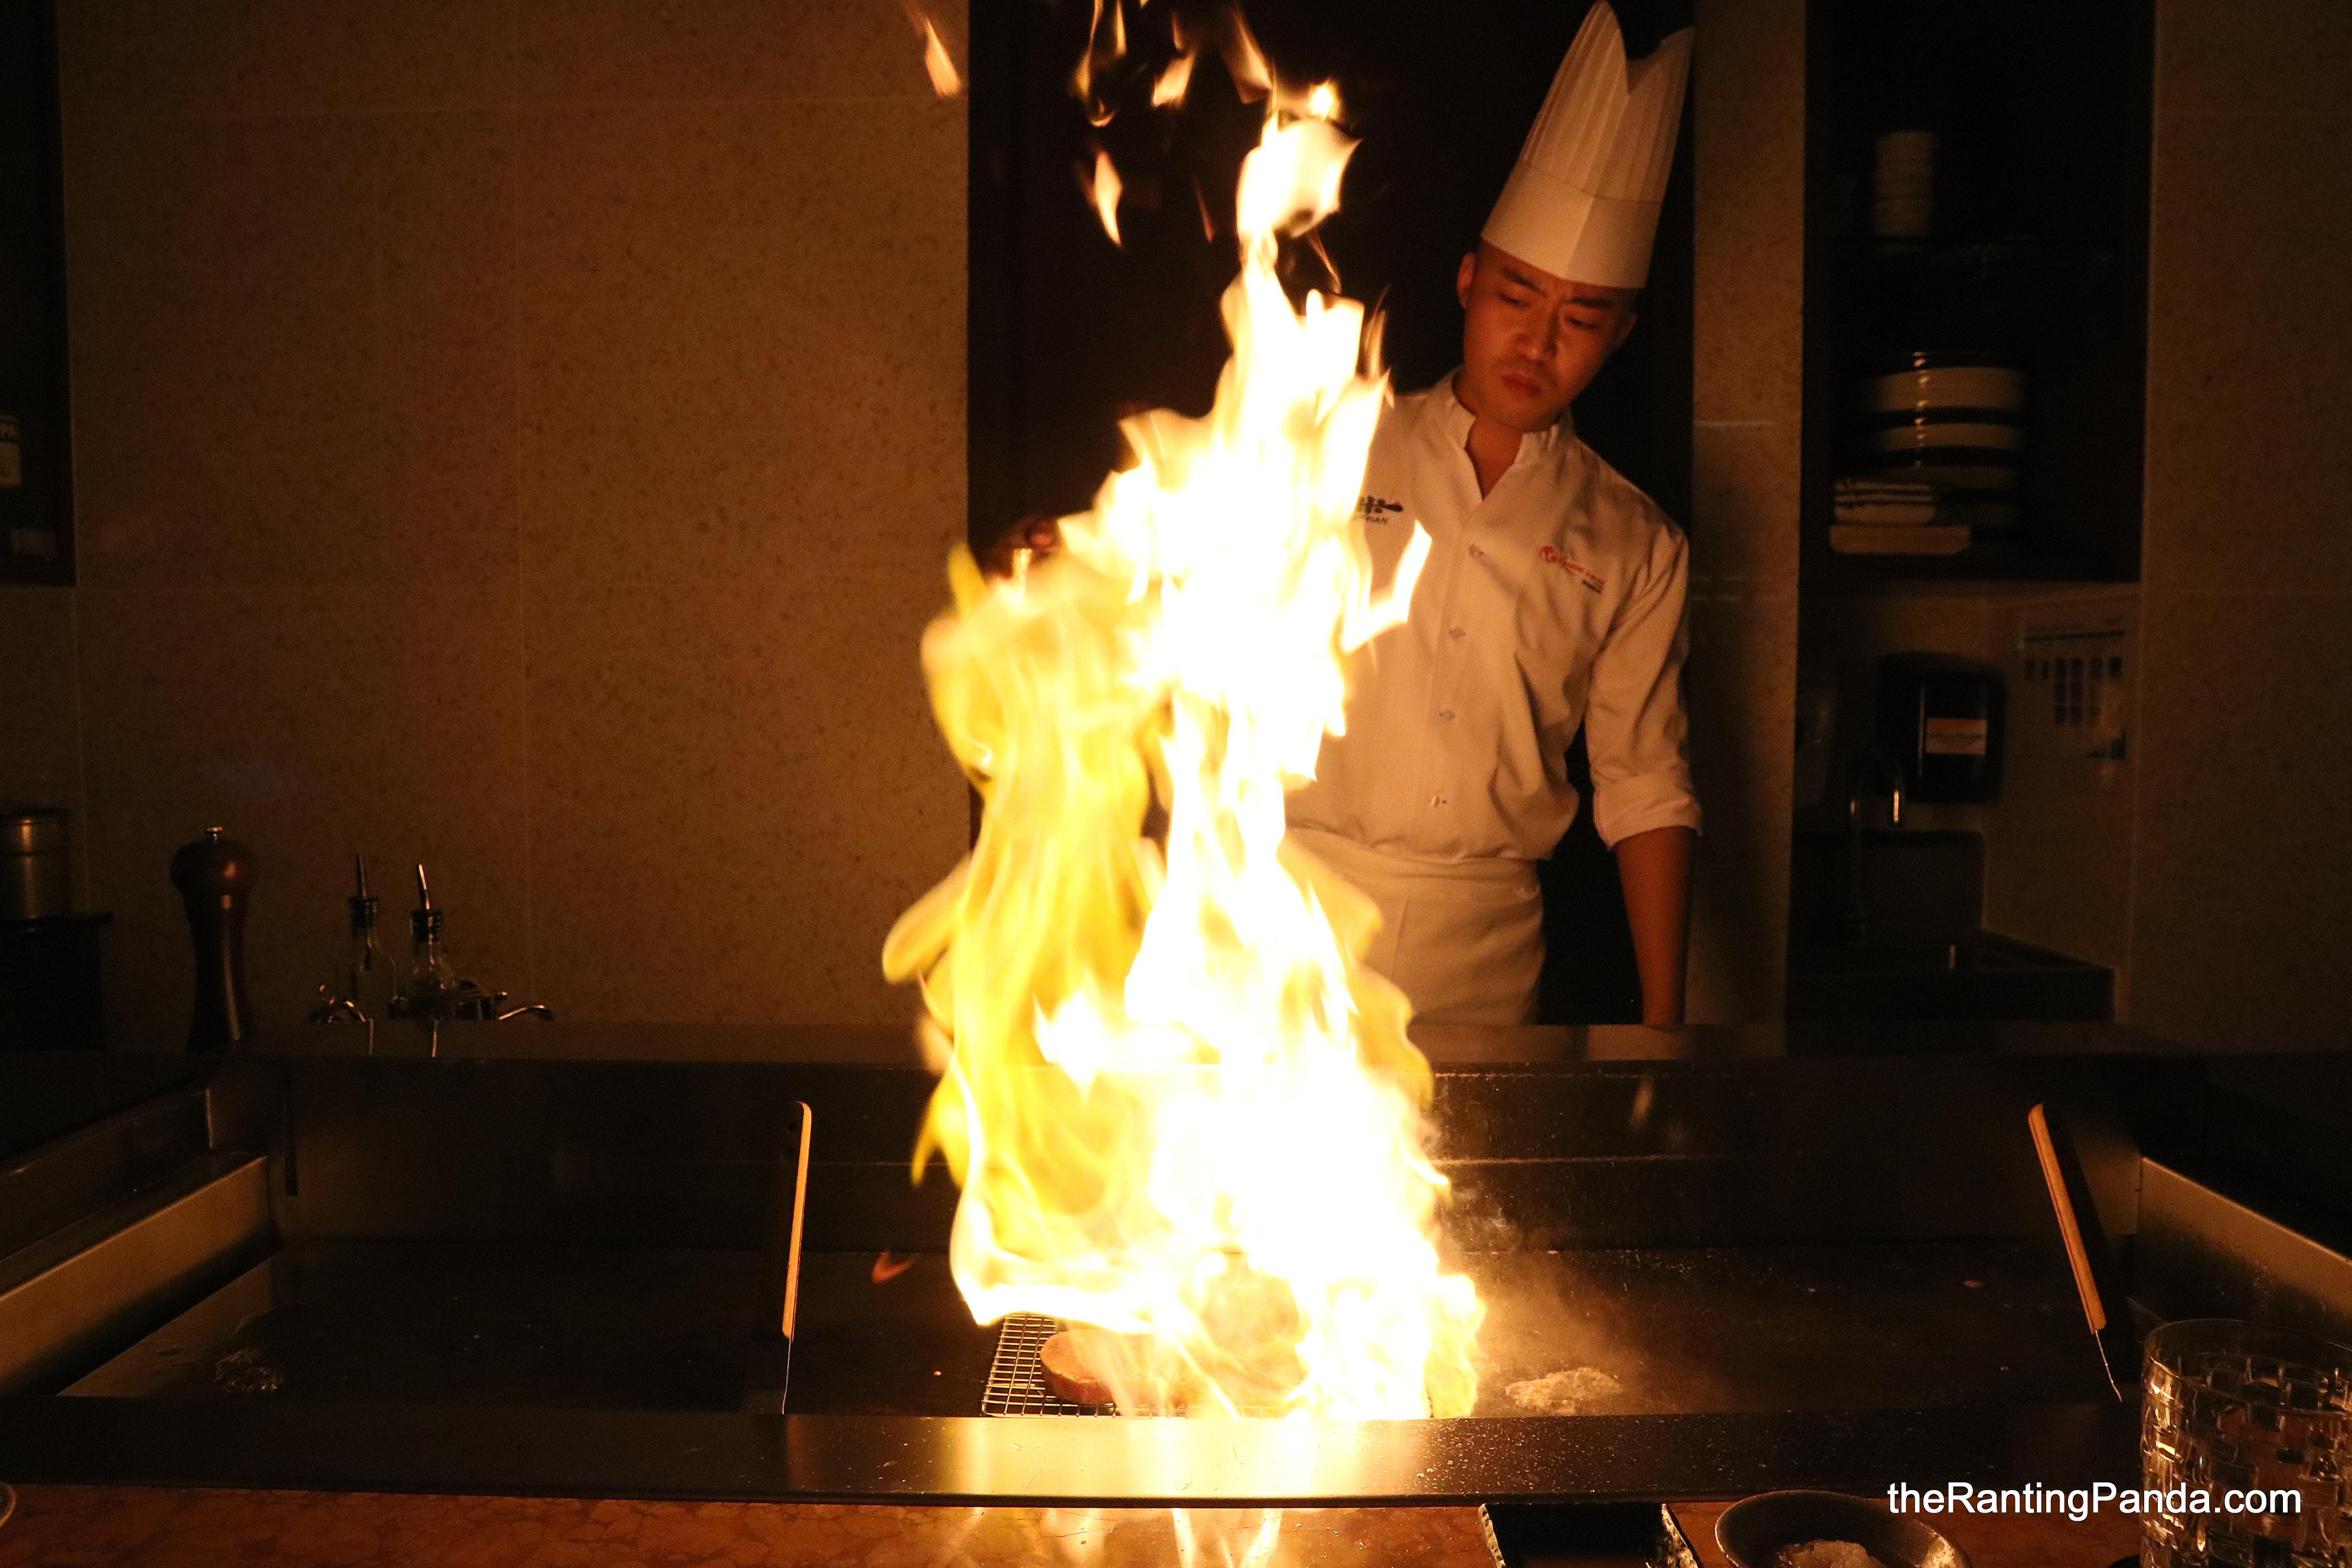 Food Review: Teppan by Chef Yonemura at Resorts World Sentosa | Teppanyaki meets Kaiseki by Japan's One Michelin Star Chef Yonemura